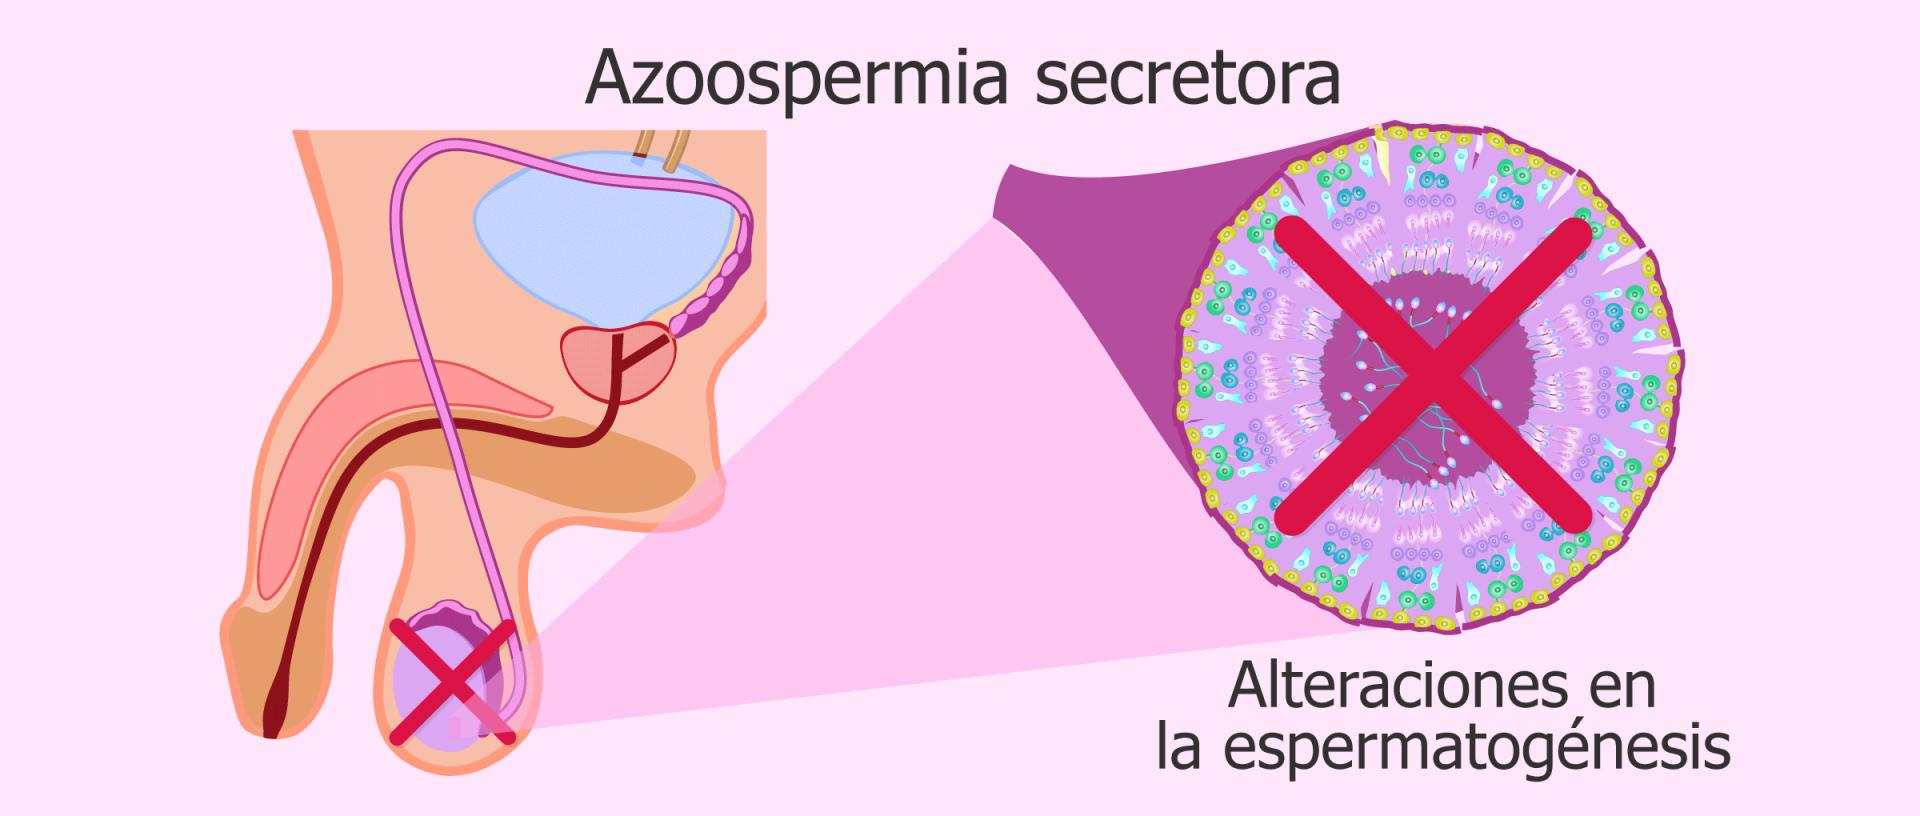 Azoospermia secretora